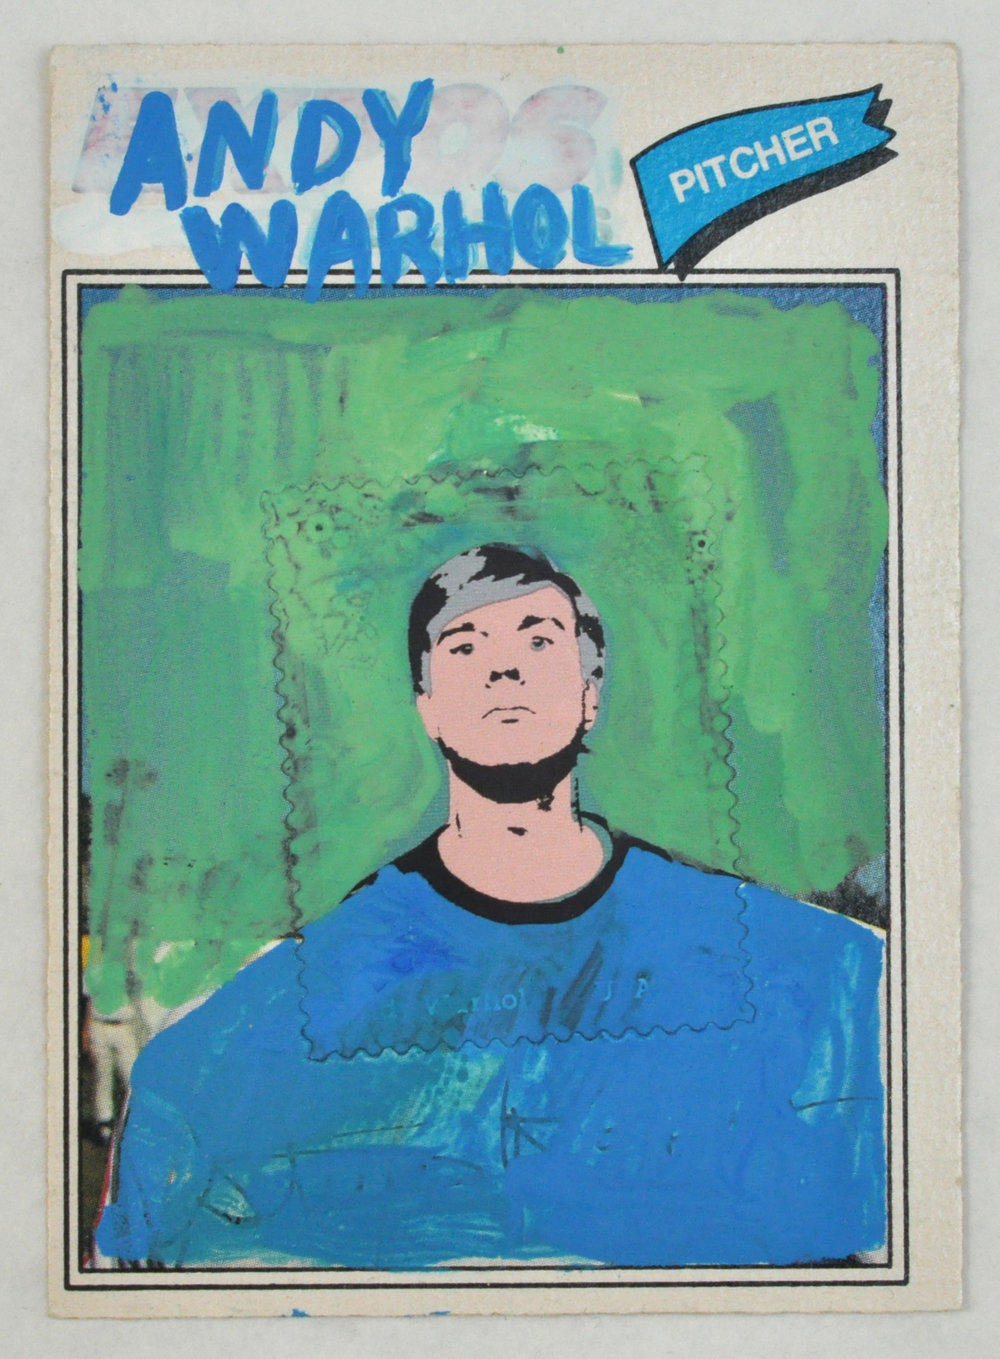 Sporting Card #15 (Andy Warhol)